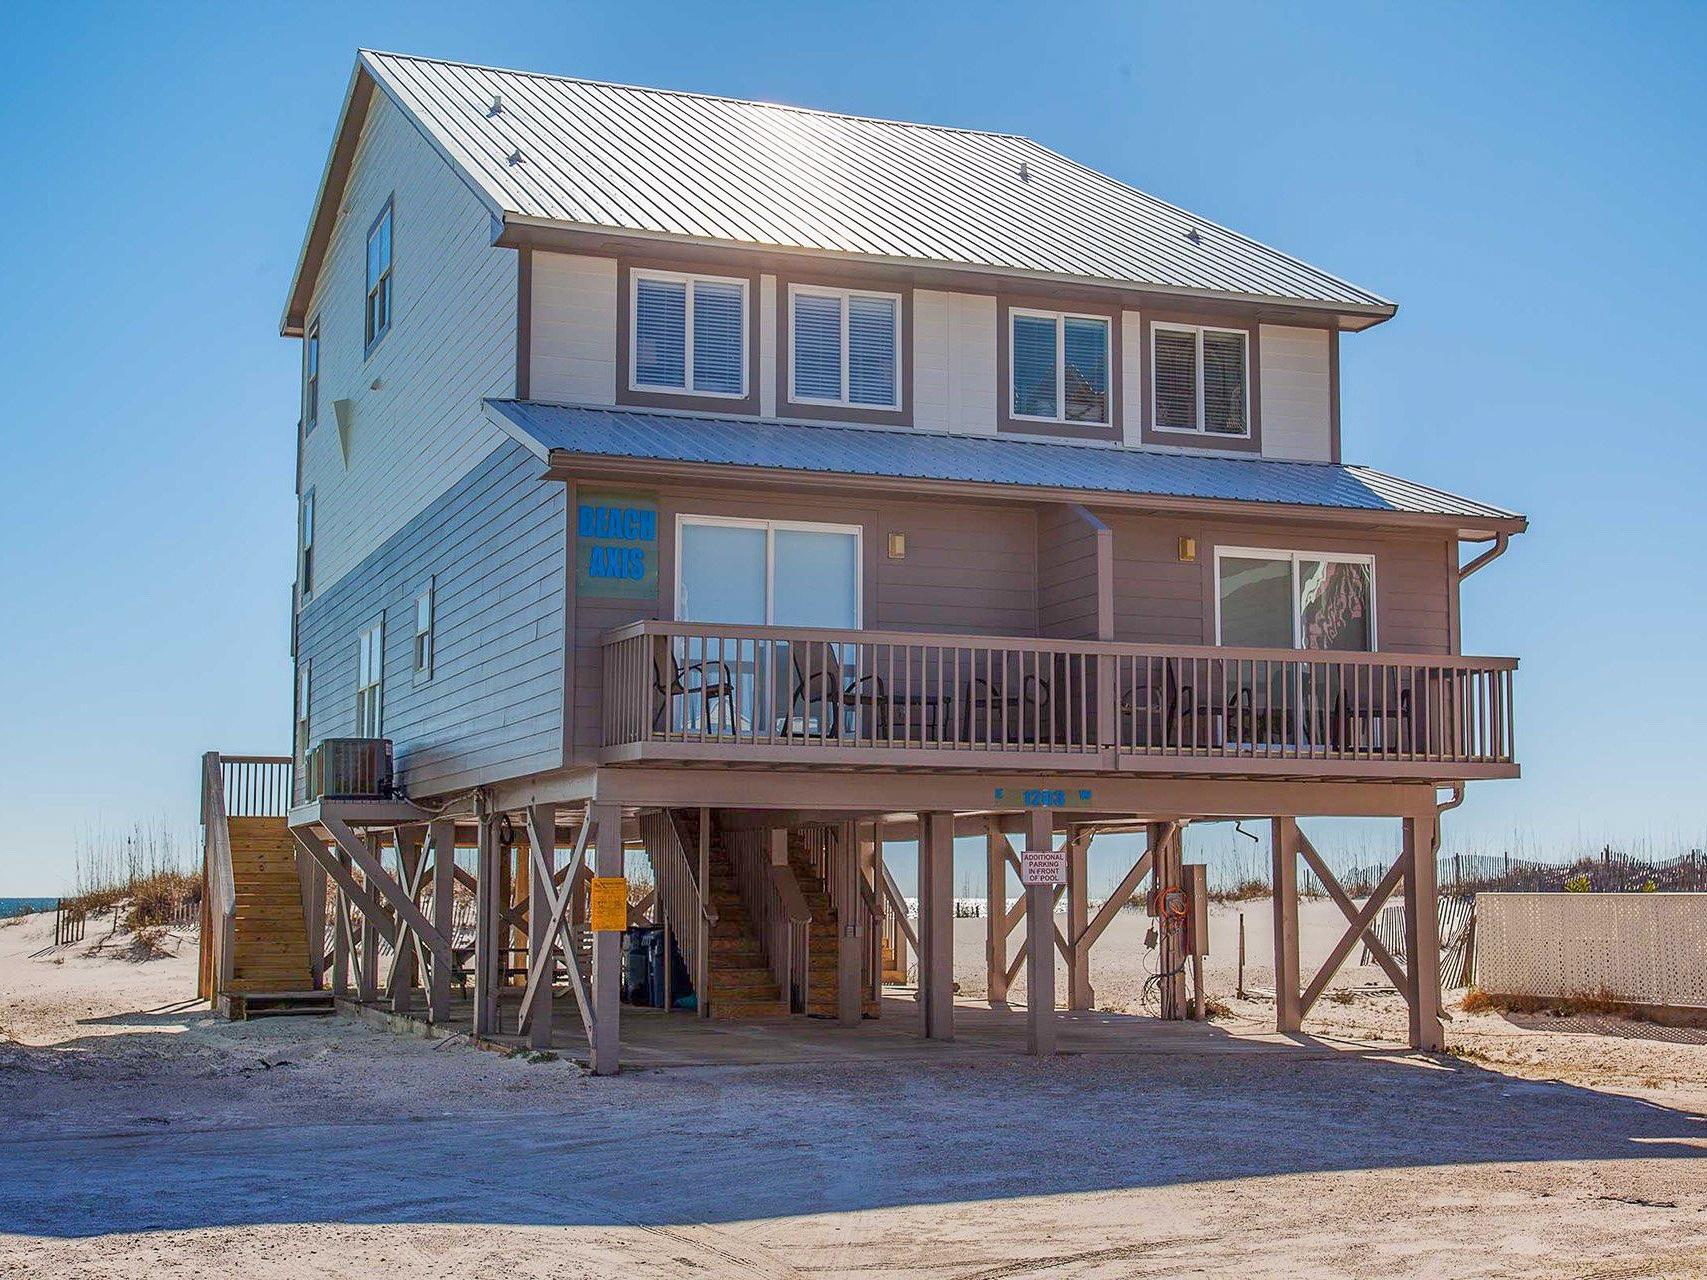 Beach House, Gulf Shores, Alabama